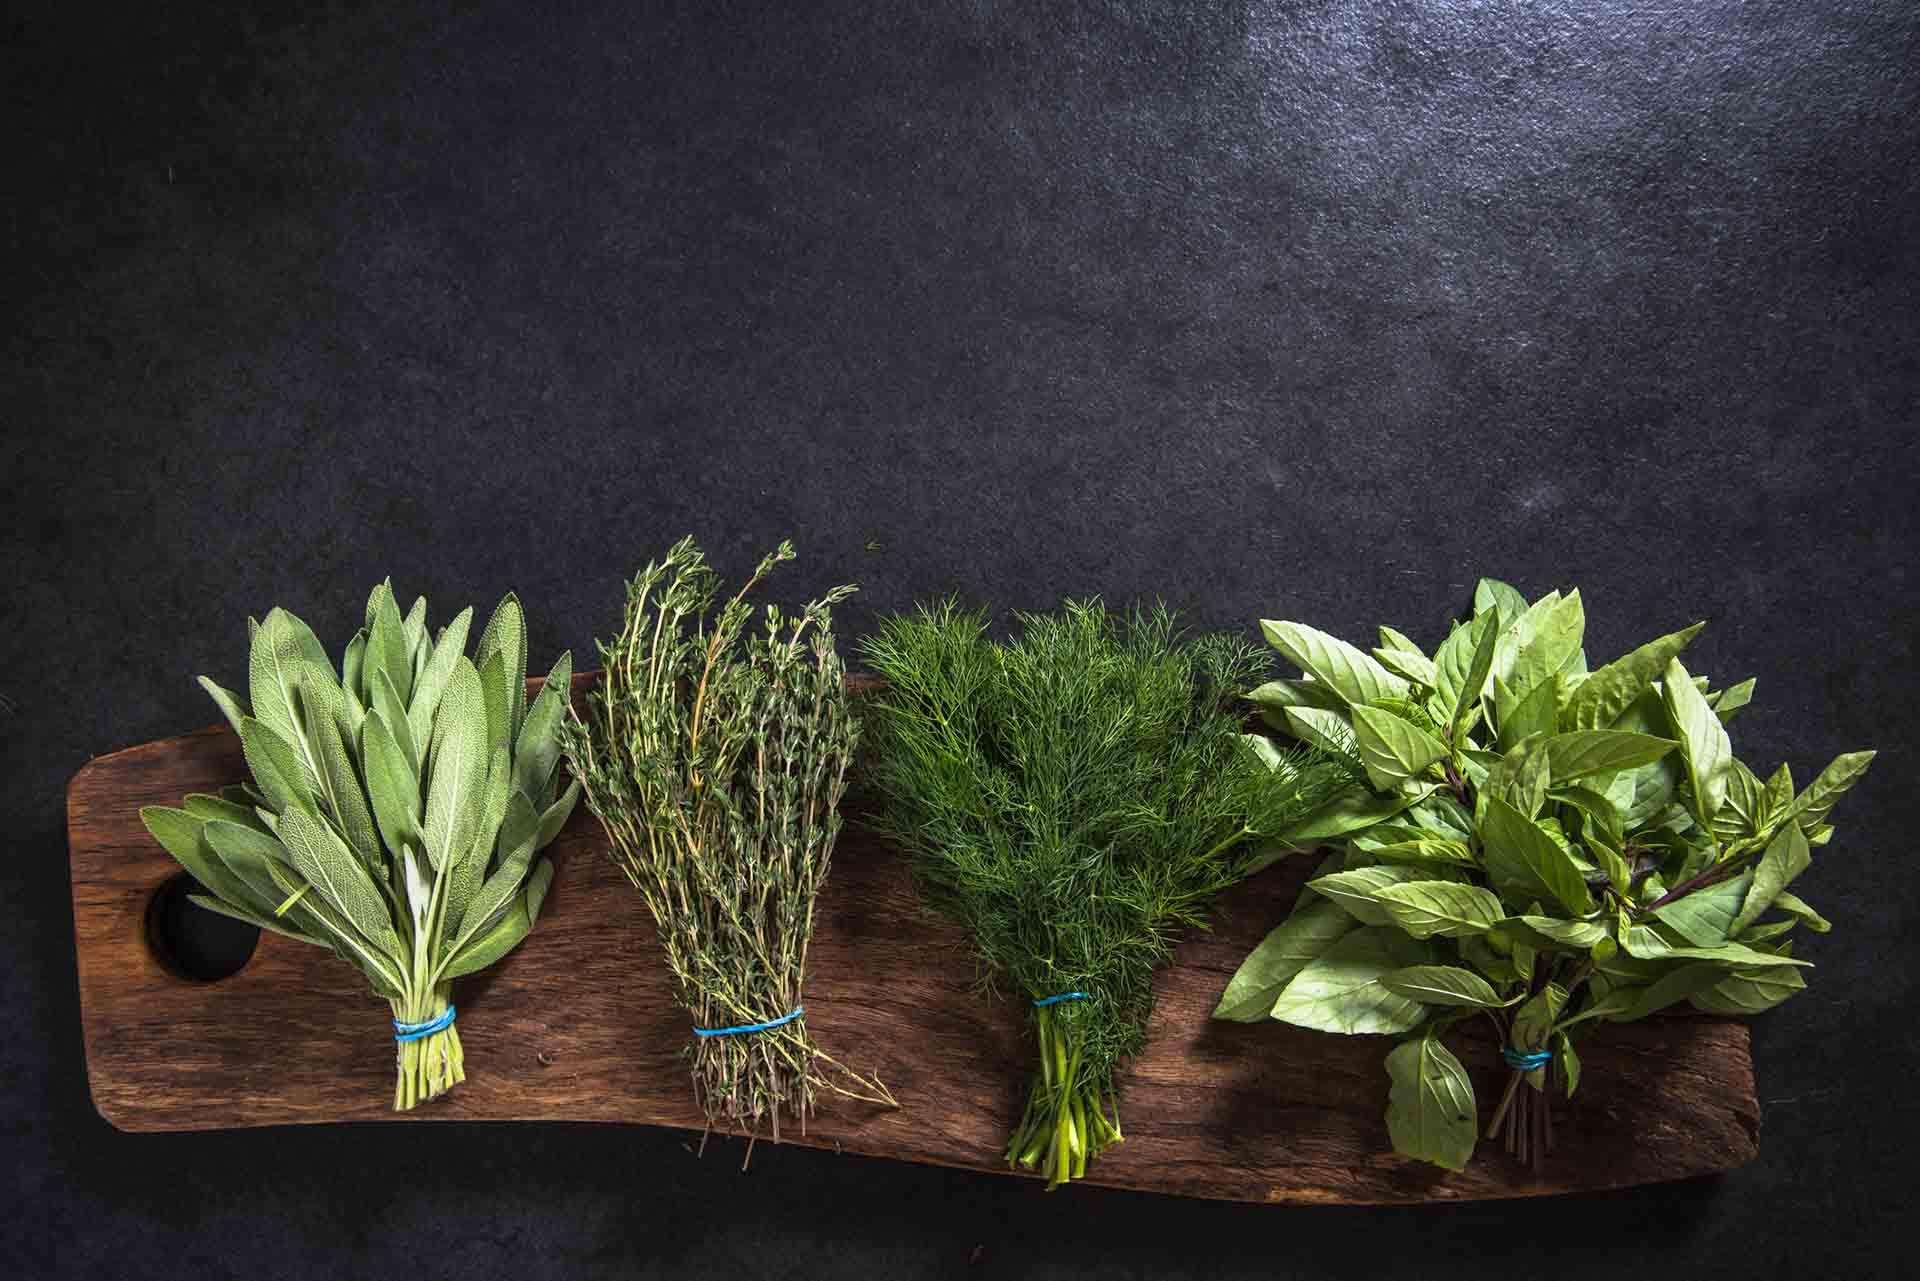 fresh herbs on wooden board.